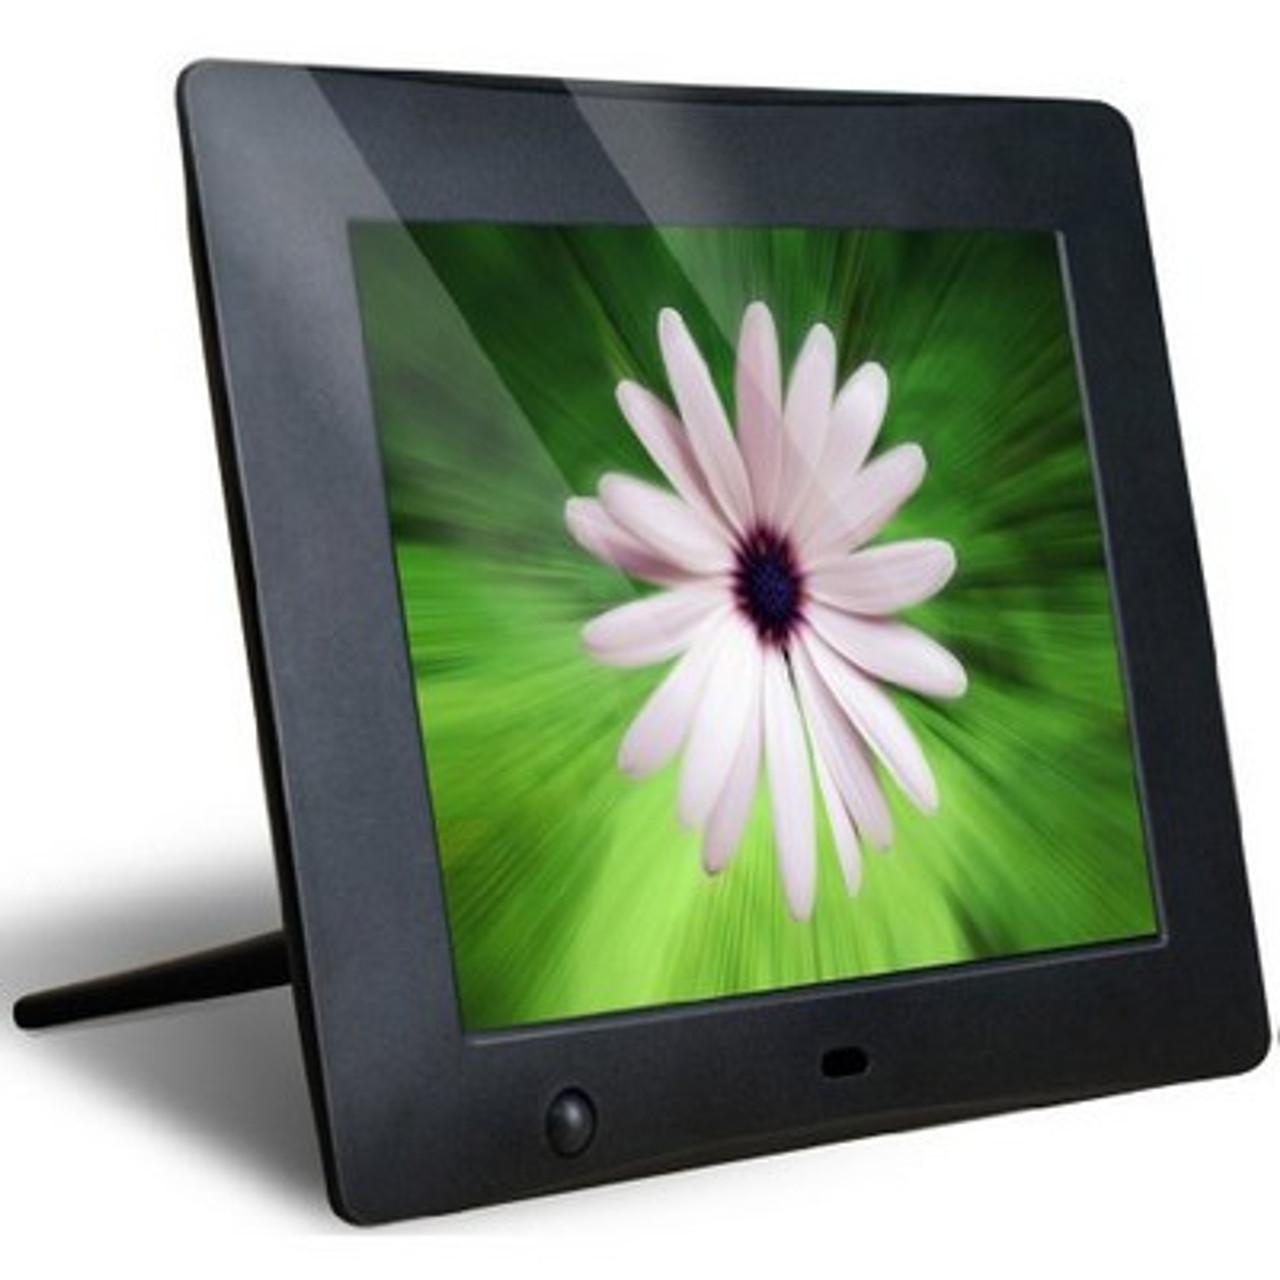 NIX X08D 8 inch Hi-Res Digital Photo Frame with Motion Sensor ...